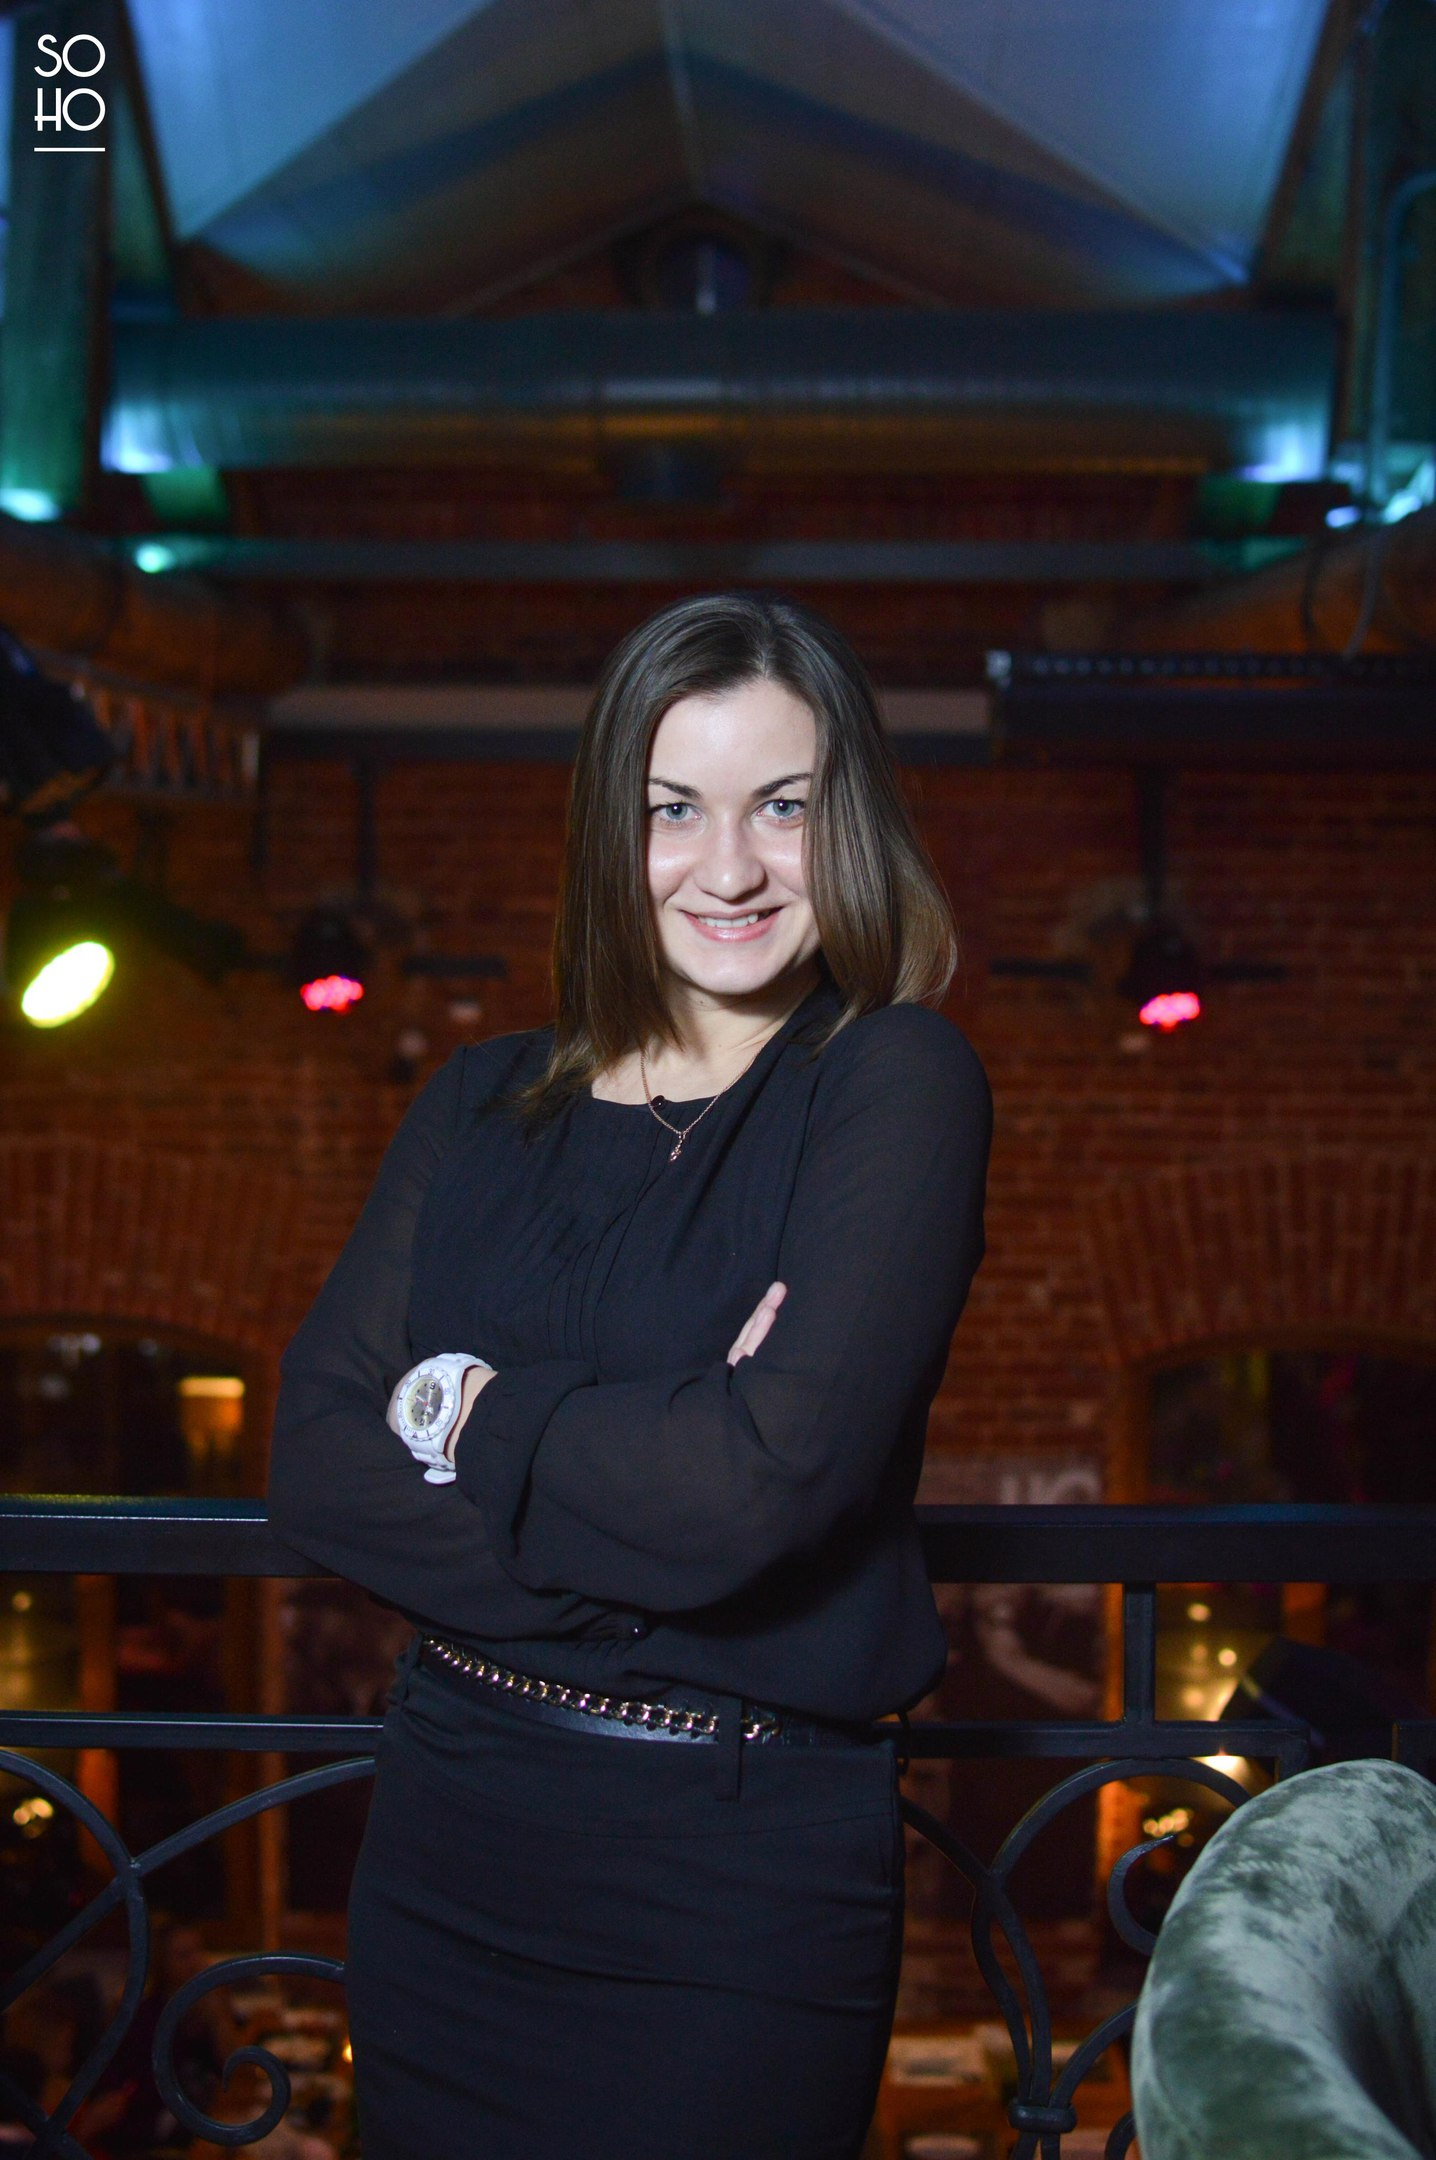 Маркелова Александра Игоревна